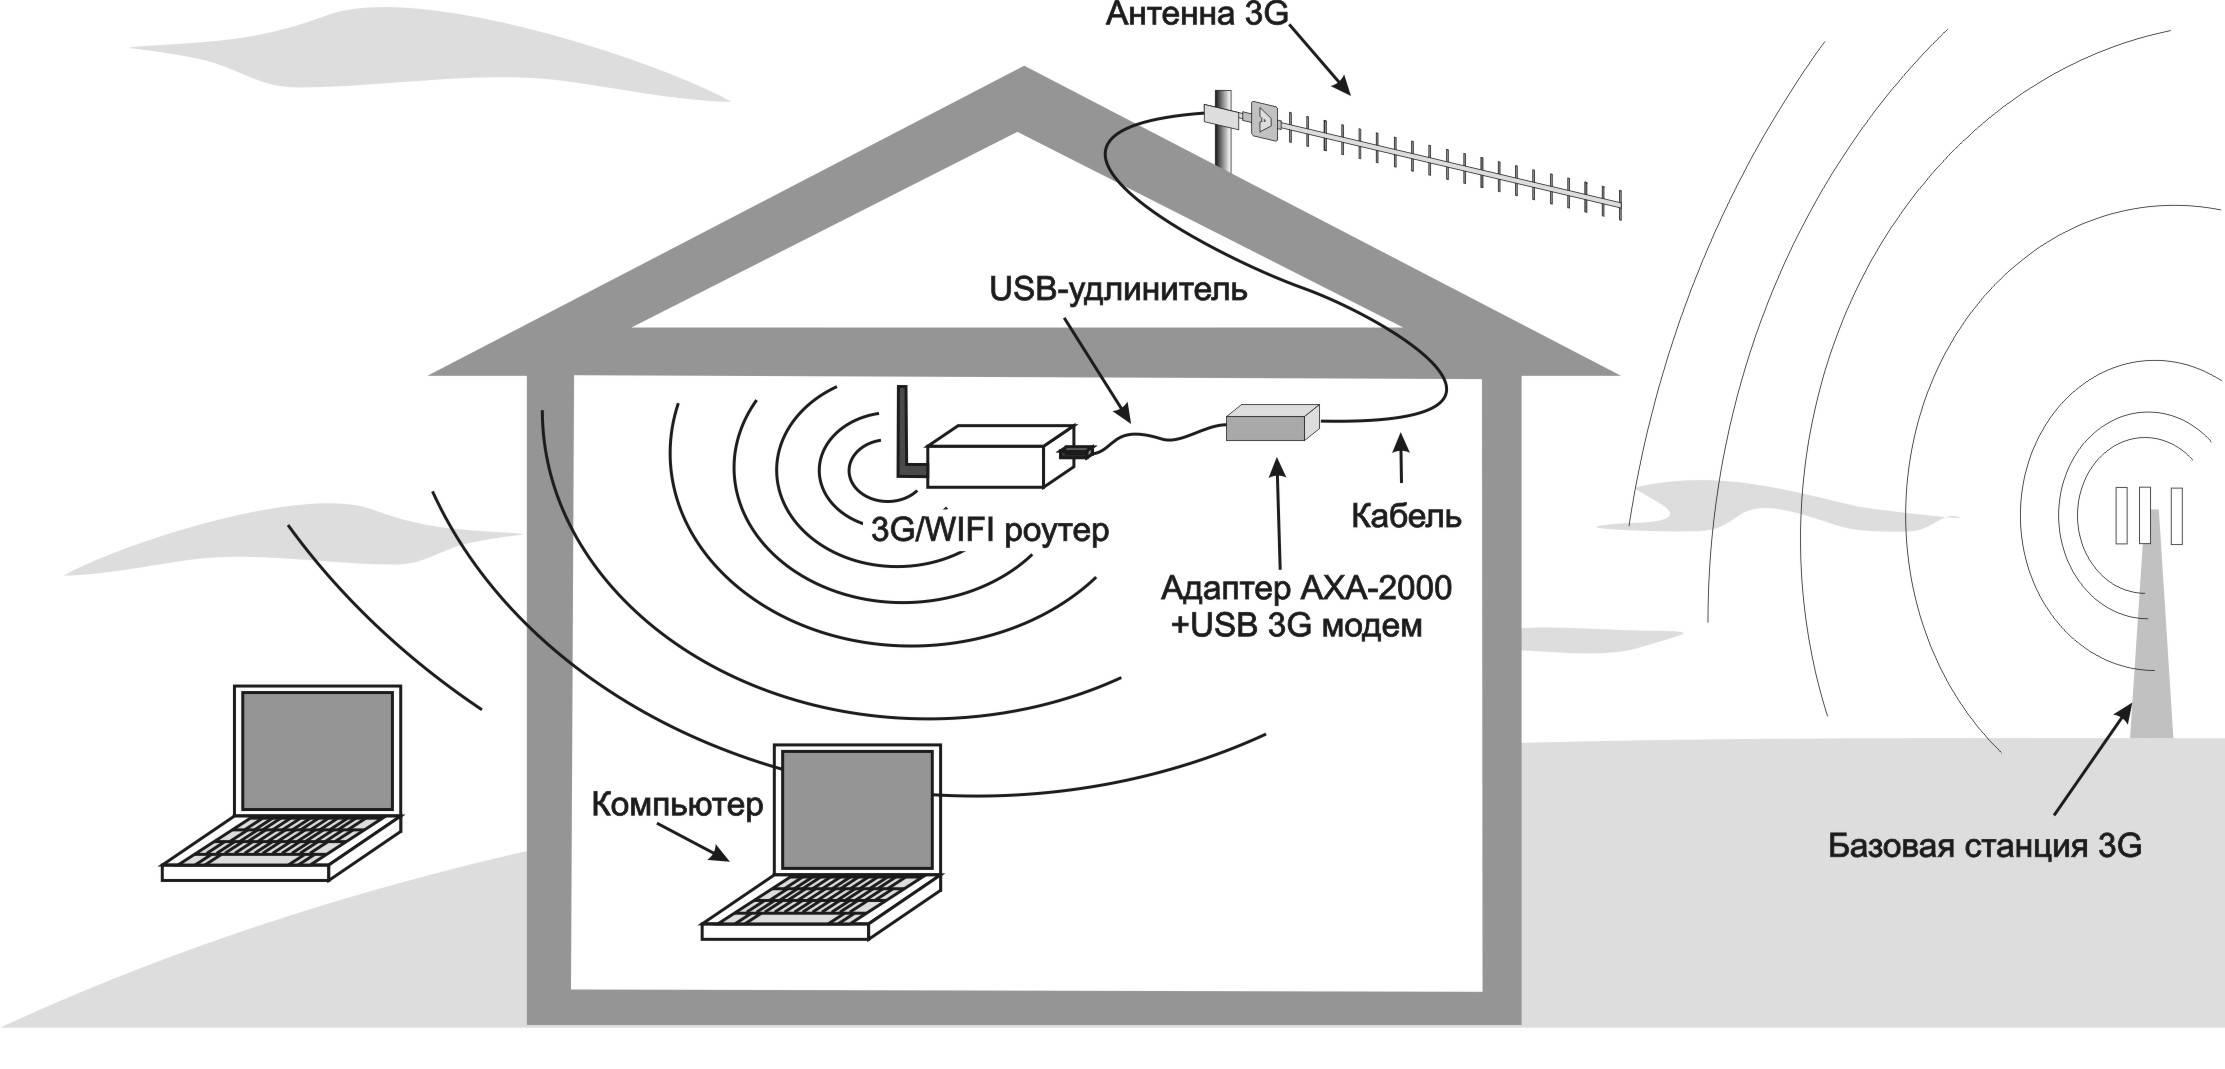 Как настроить wi-fi репитер